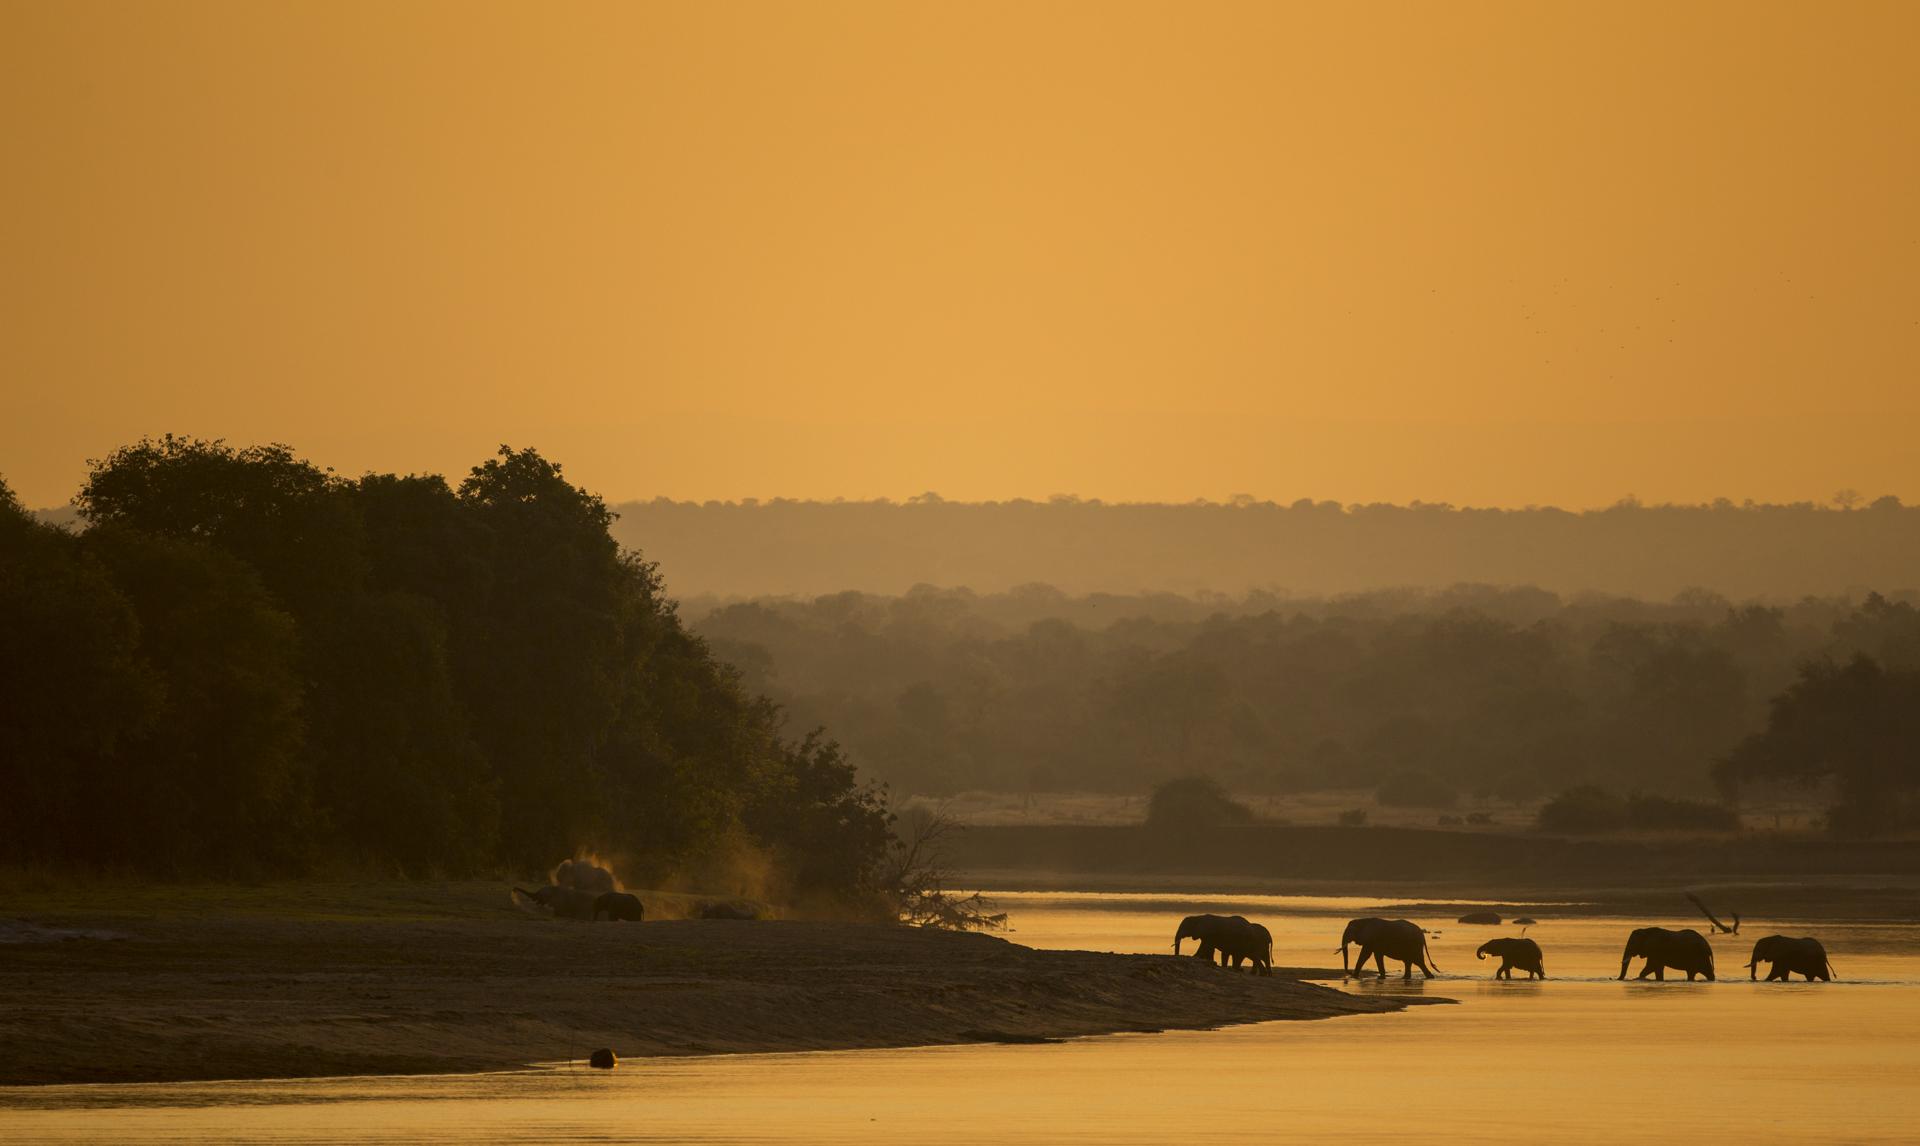 African elephants cross the Luangwa river, Zambia